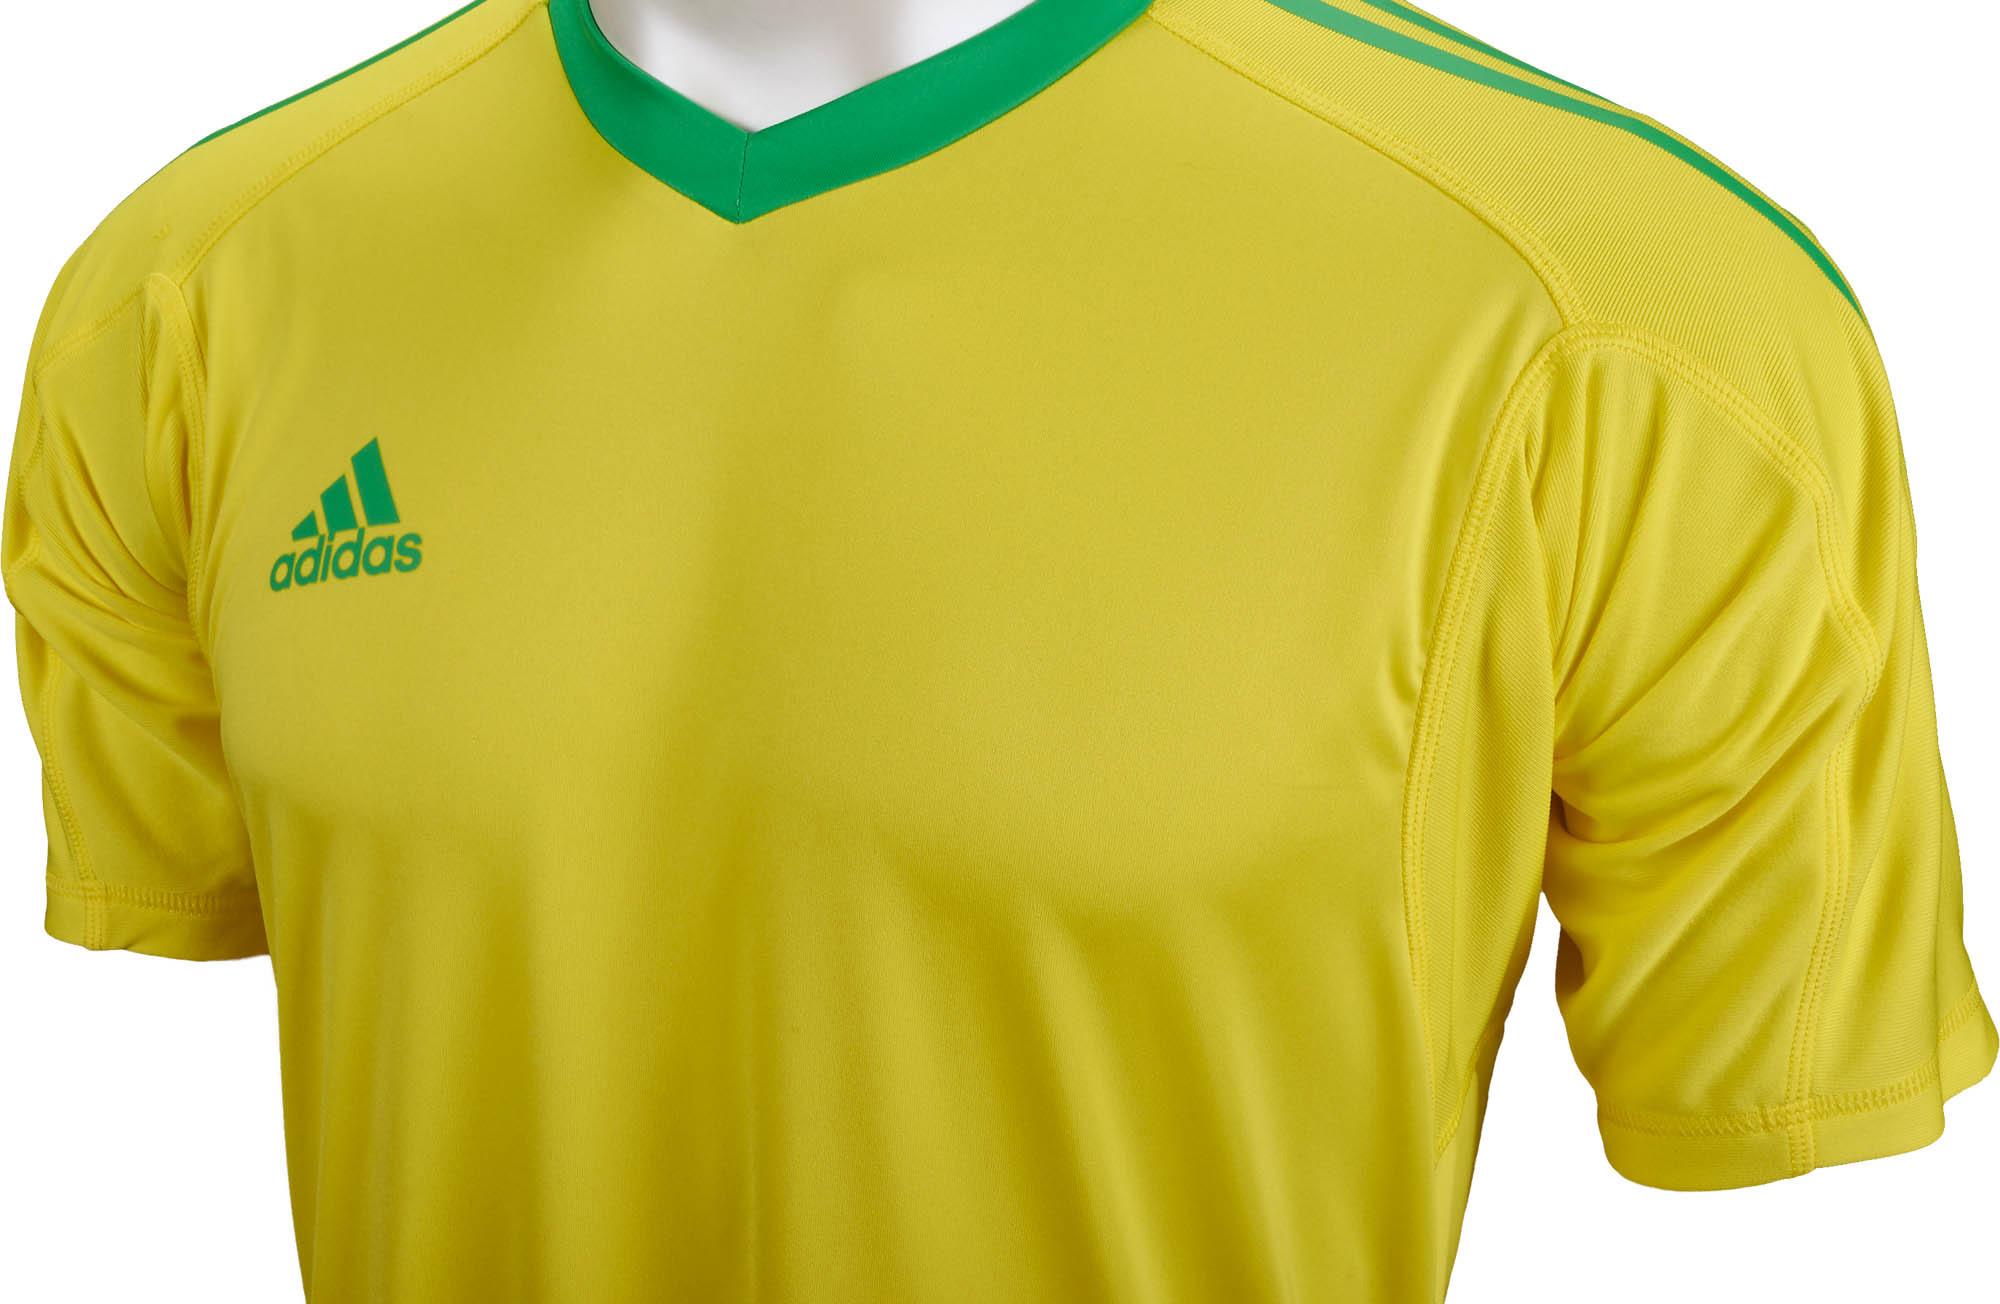 dff87b930 adidas Revigo 17 S/S Goalkeeper Jersey - Bright Yellow & Energy ...